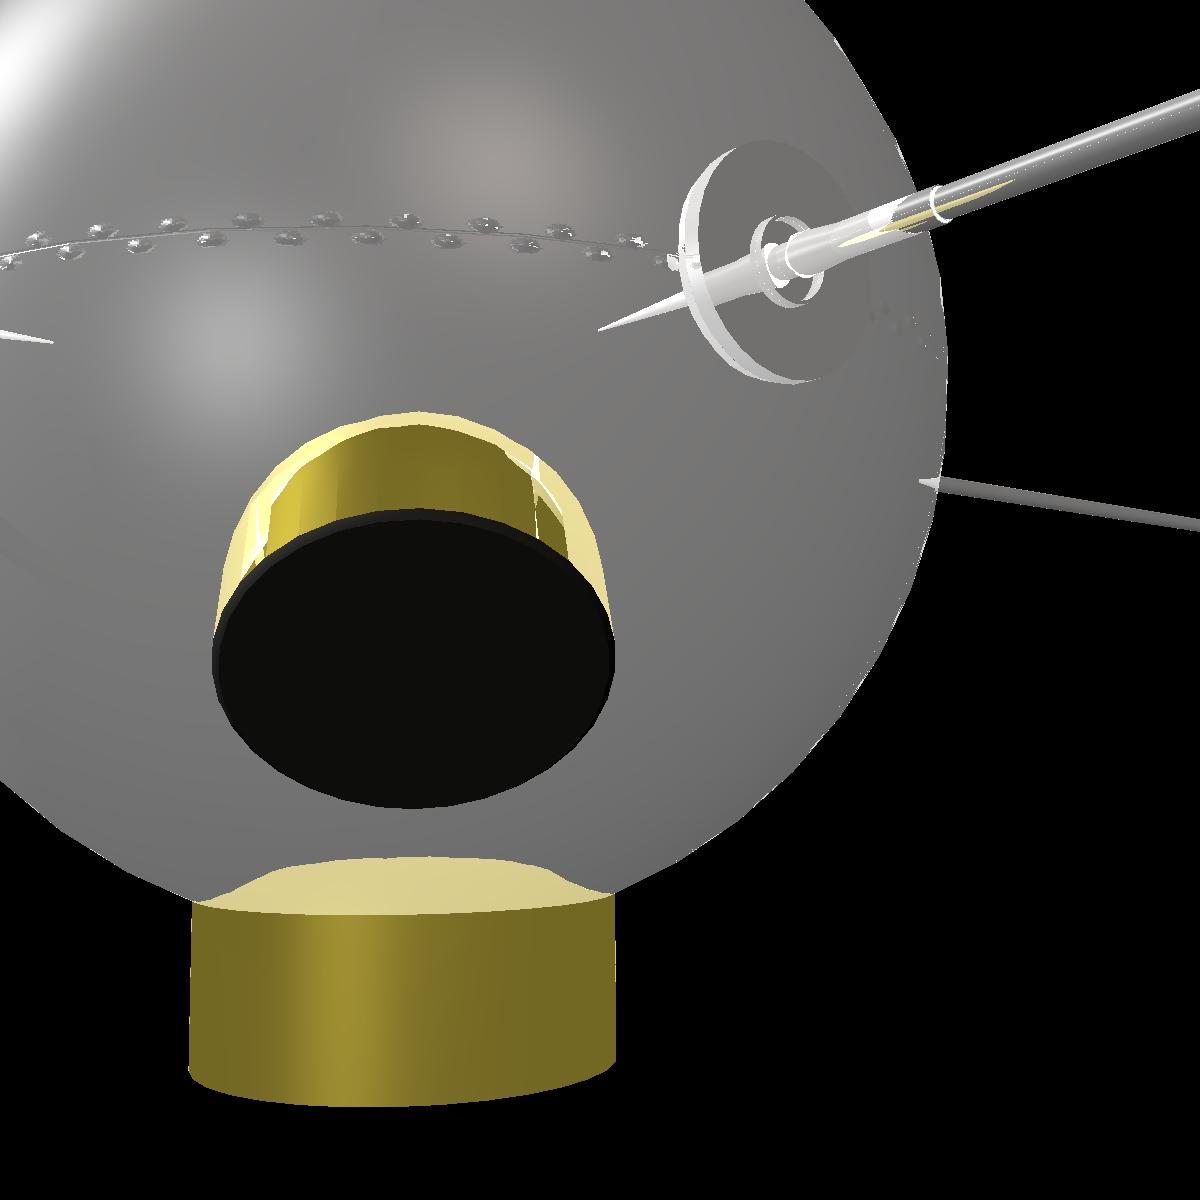 avangard ii satelit 3d model 3ds dxf fbx mješavina cob dae x obj 163940